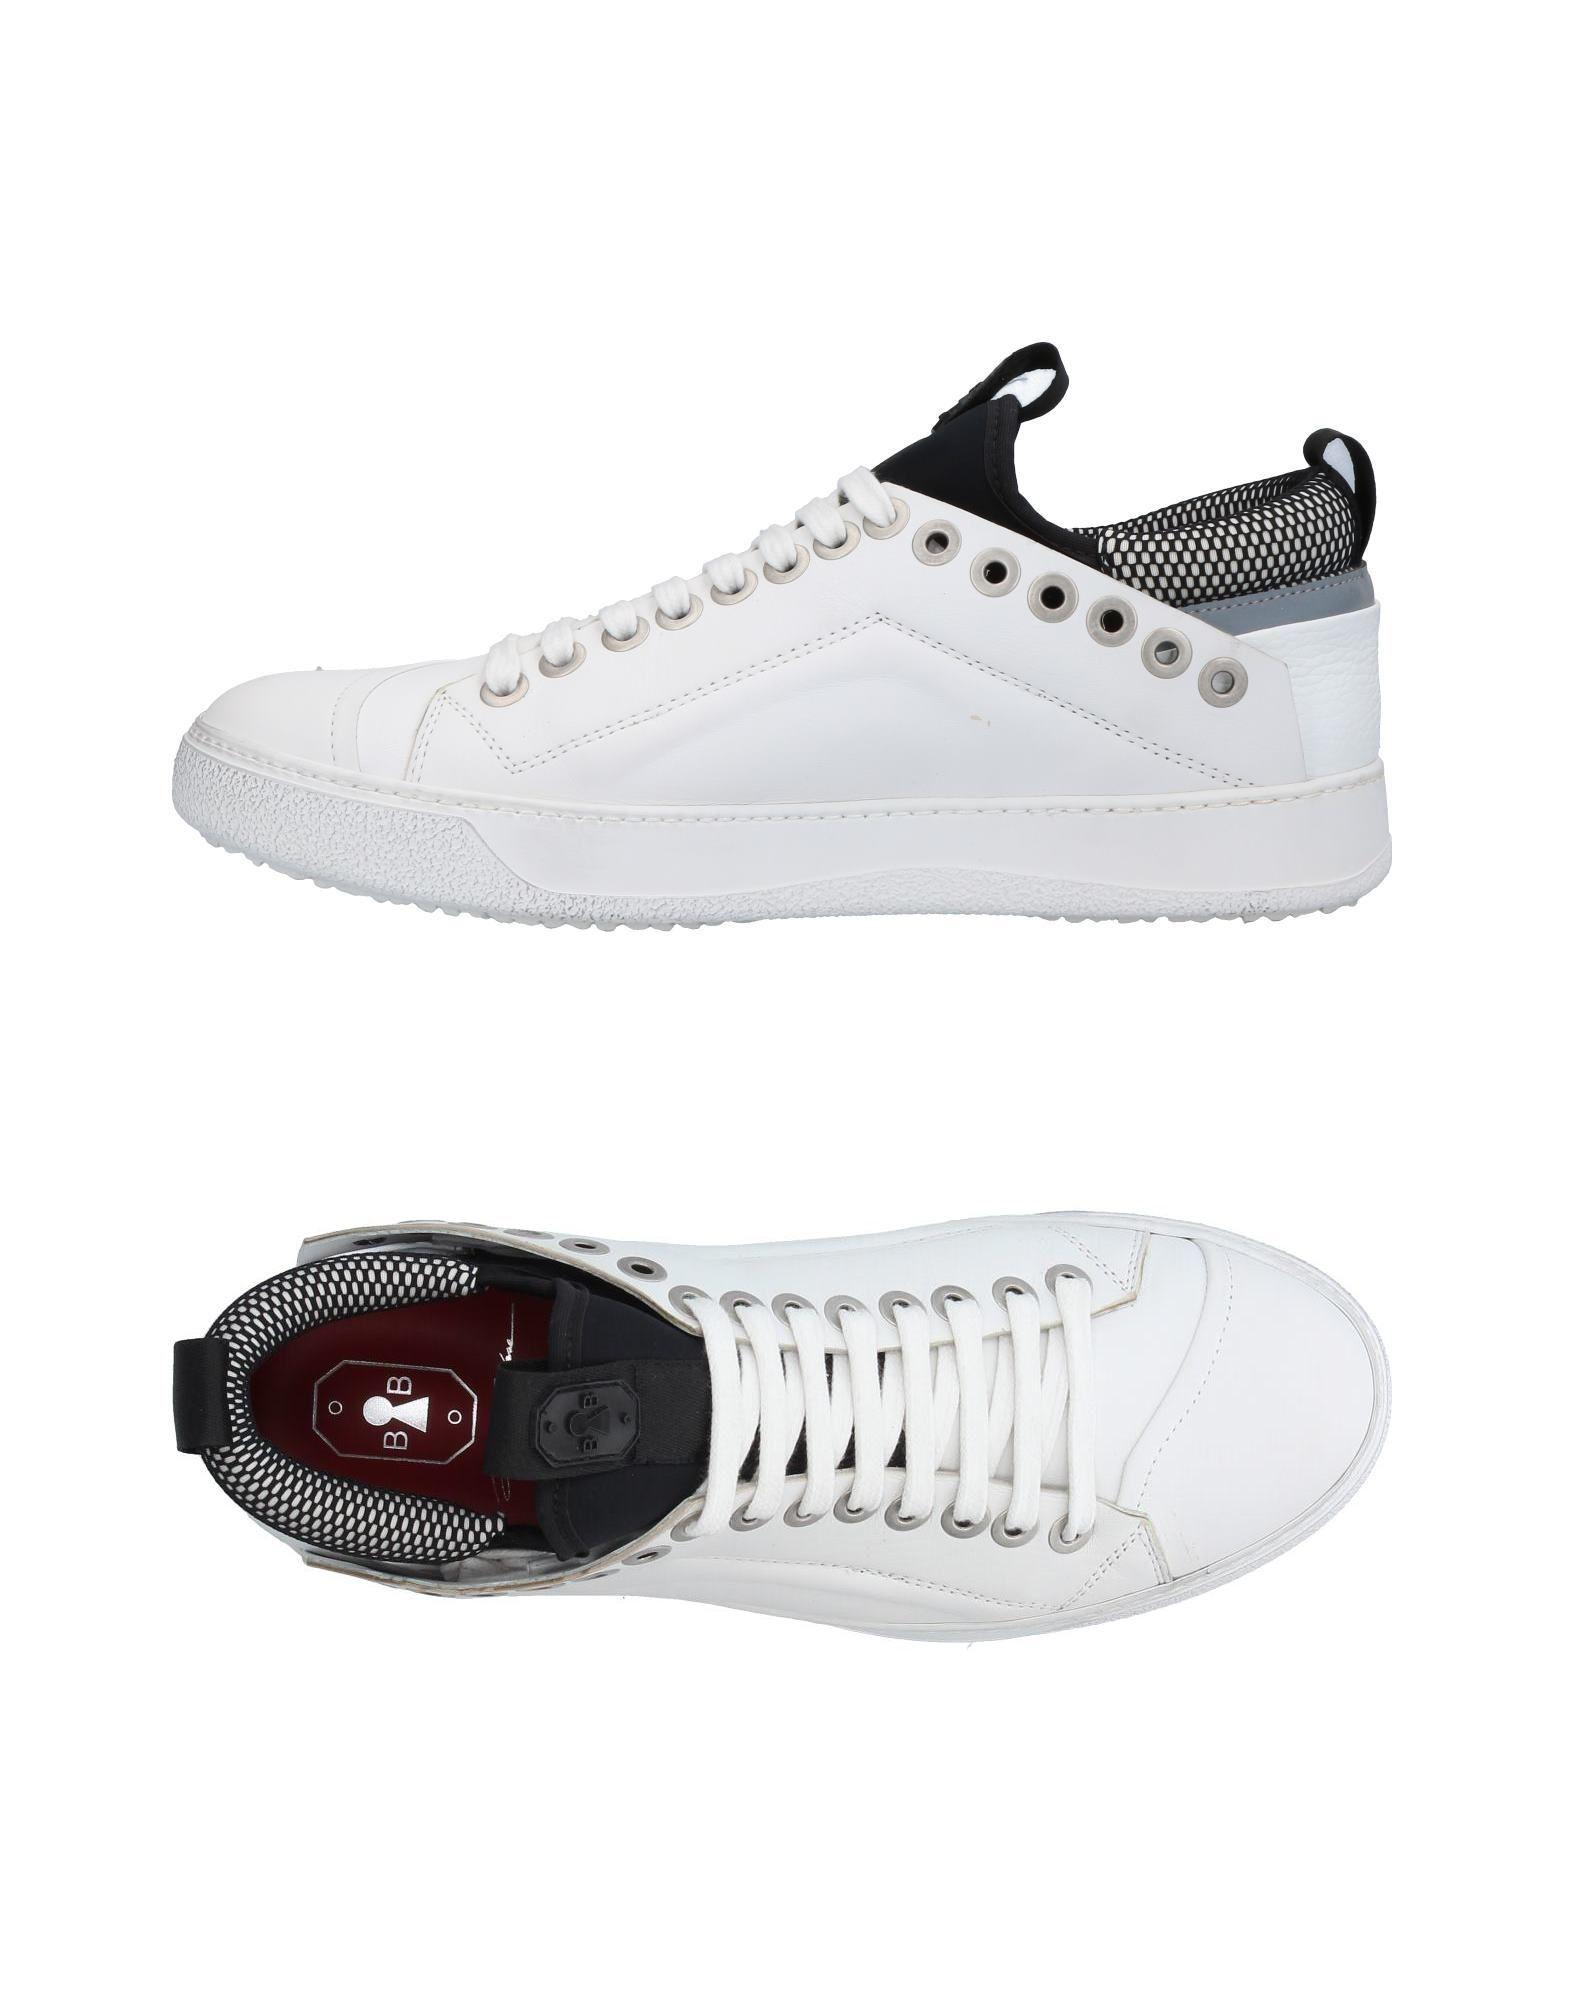 FOOTWEAR - Low-tops & sneakers Bruno Bordese ZXHWOUO06